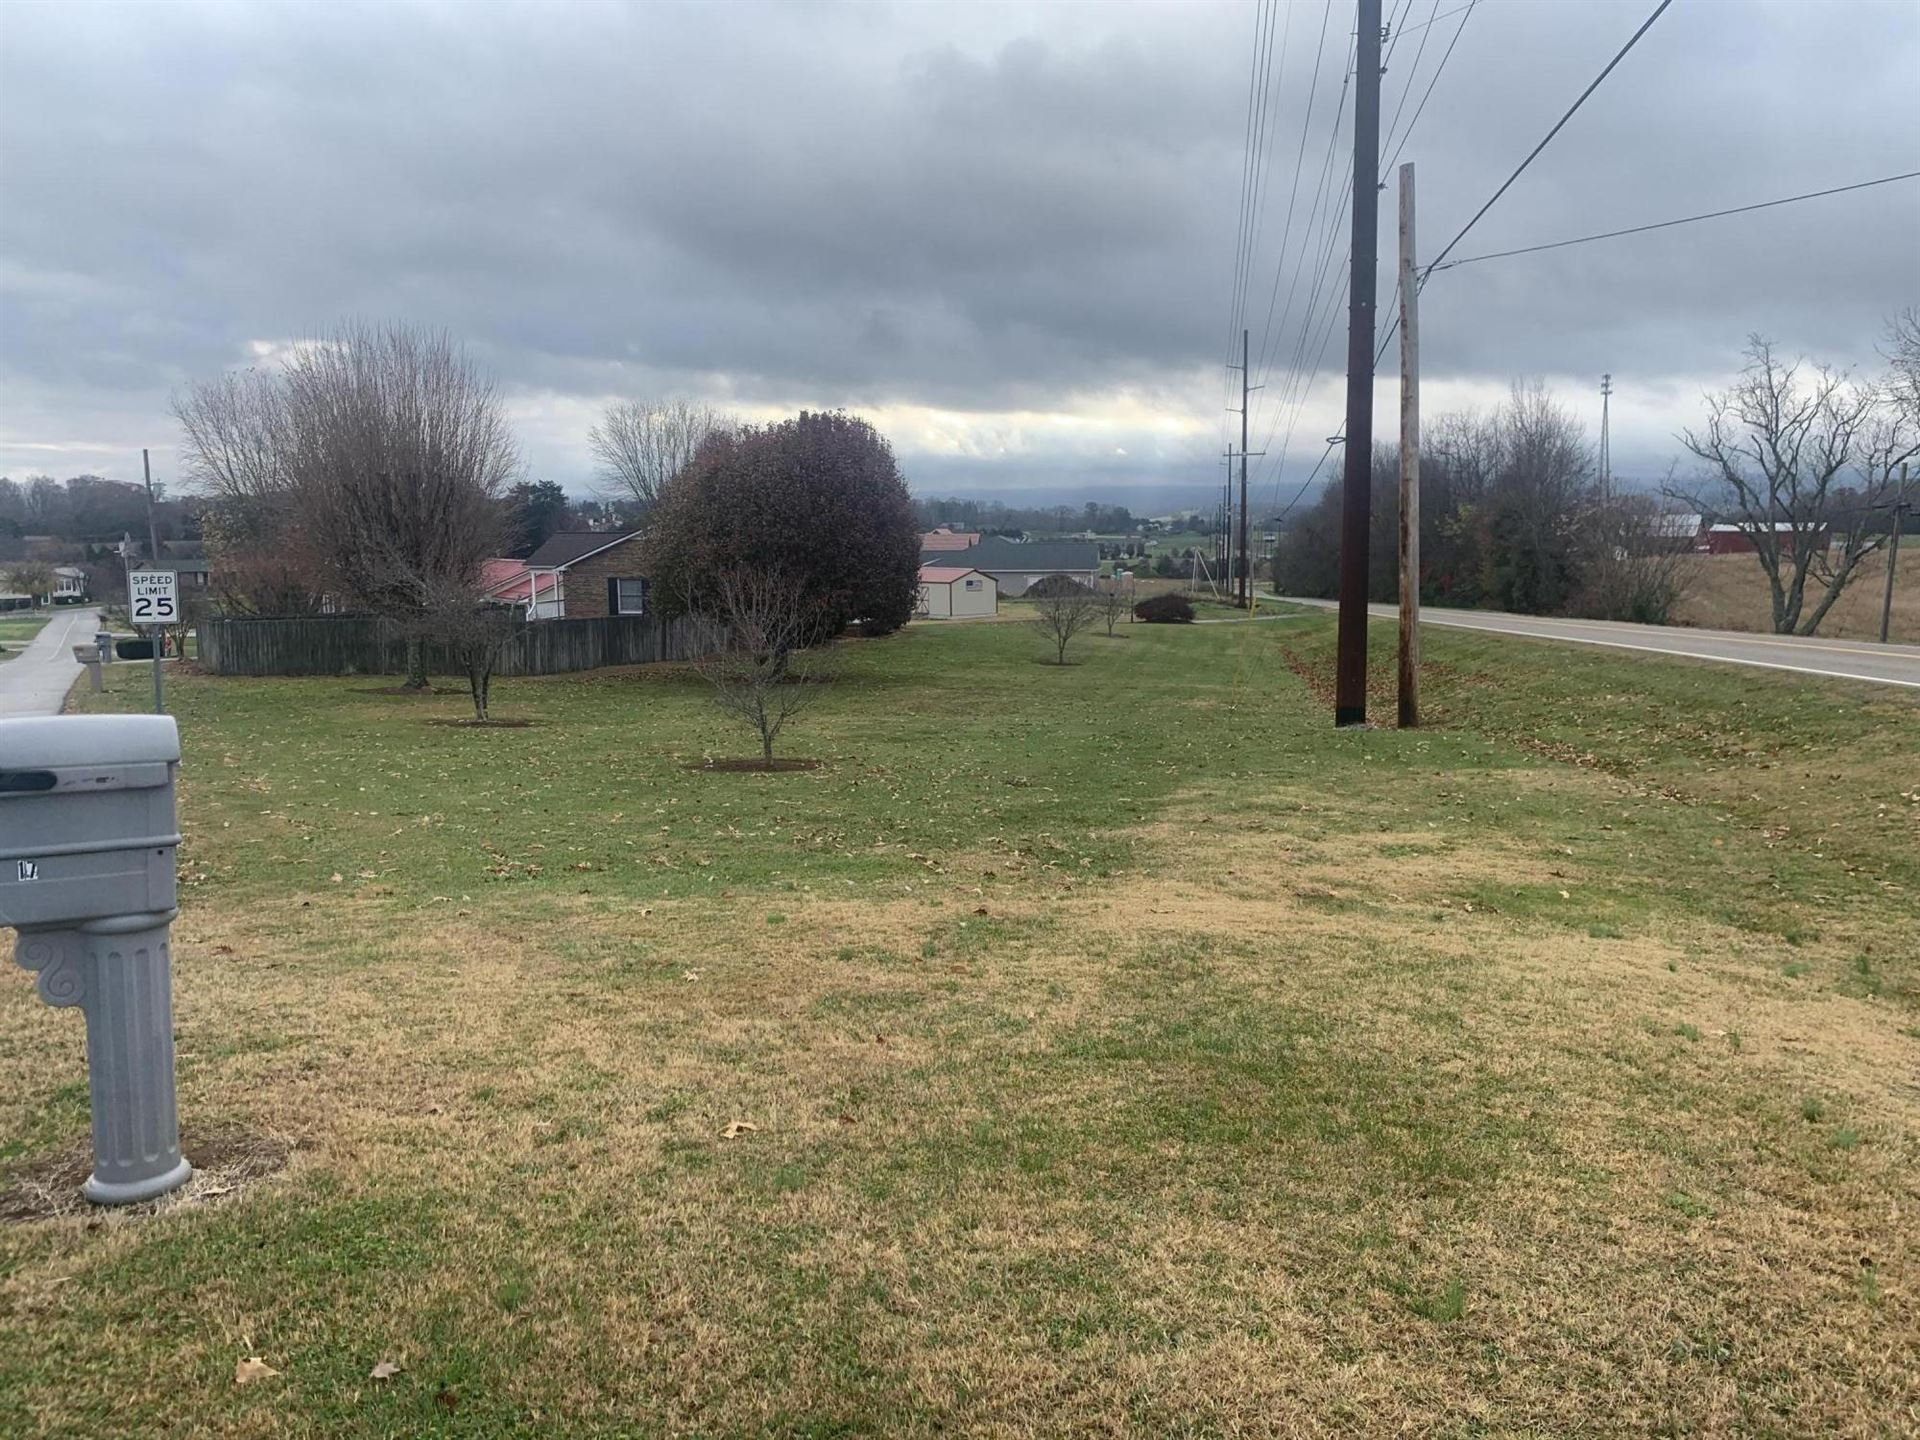 Photo of Tbd Park Ave, Tusculum, TN 37745 (MLS # 9915960)